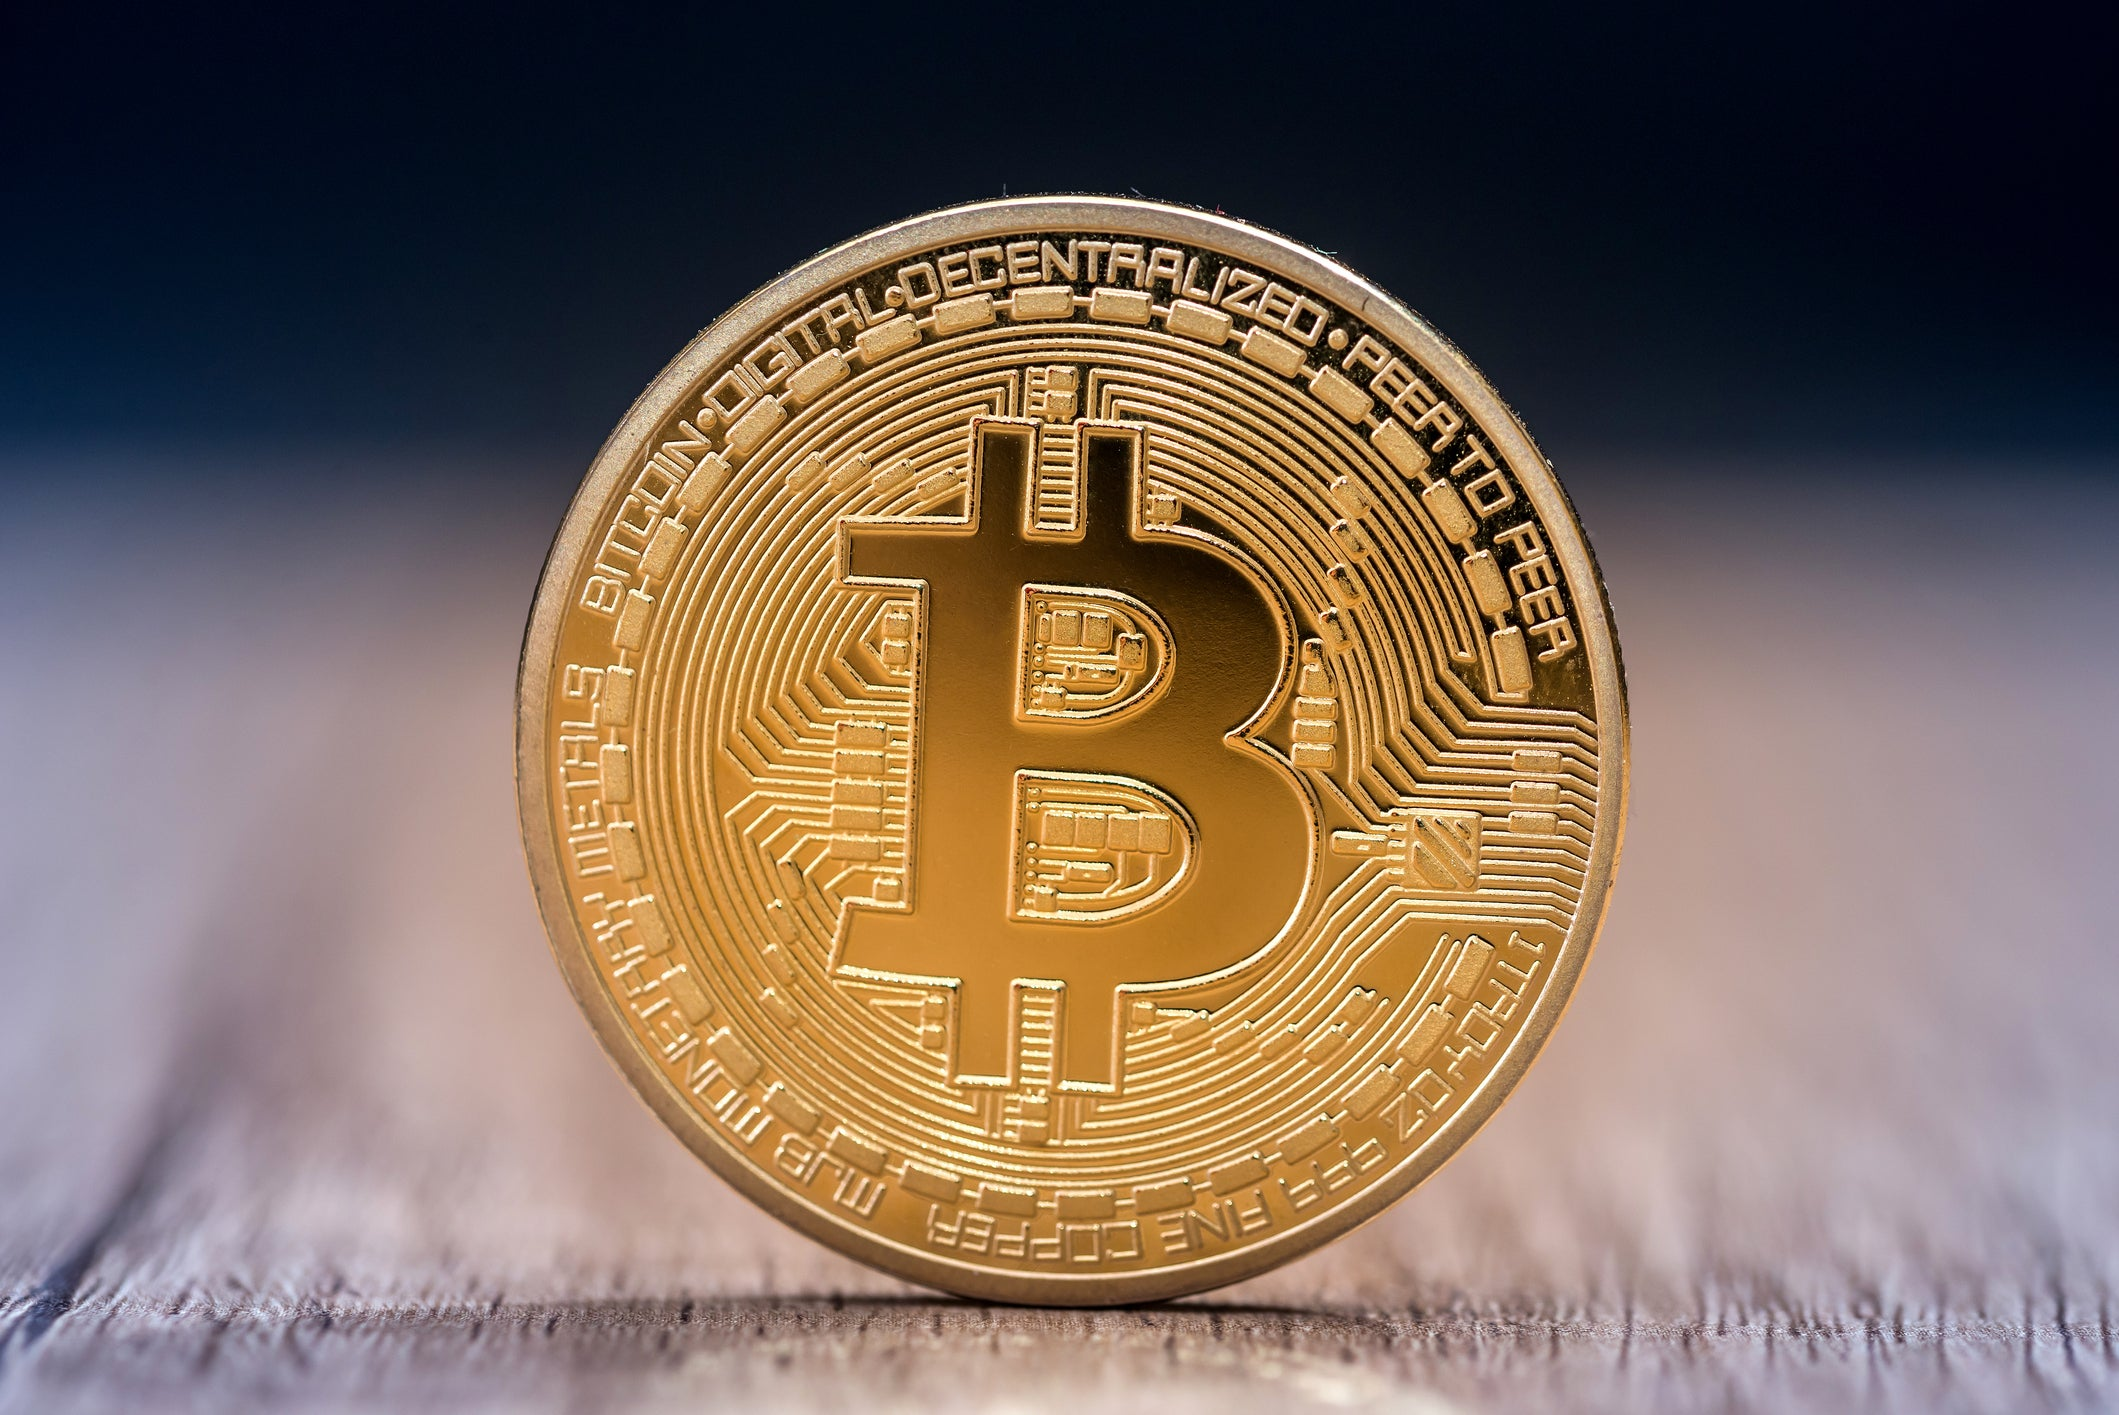 bitcoin boğaları 7 bin dolar